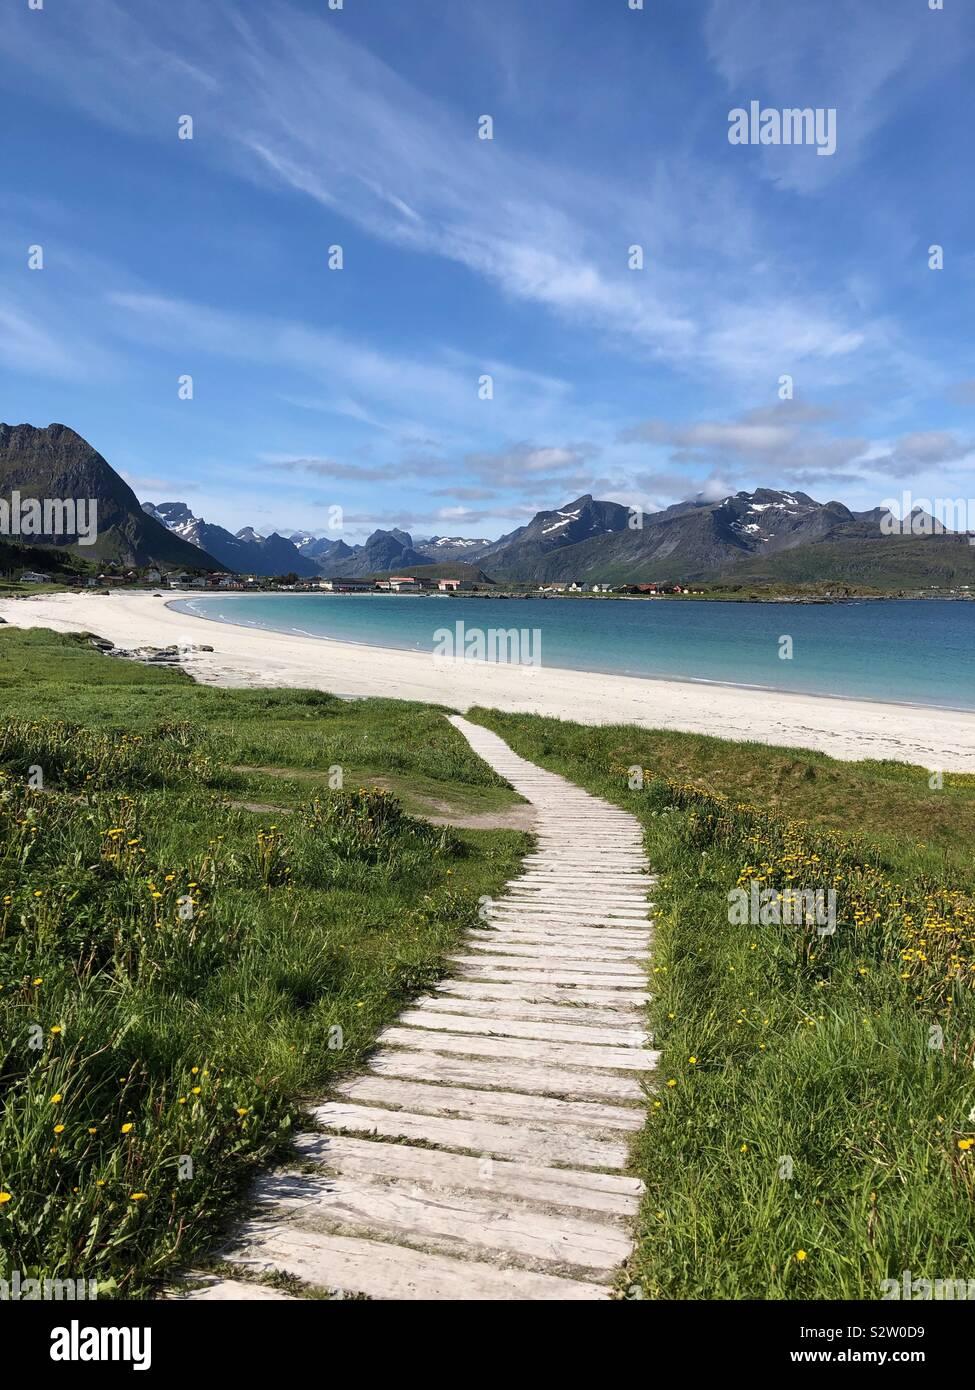 Ramberg beach, Isole Lofoten in Norvegia Foto Stock